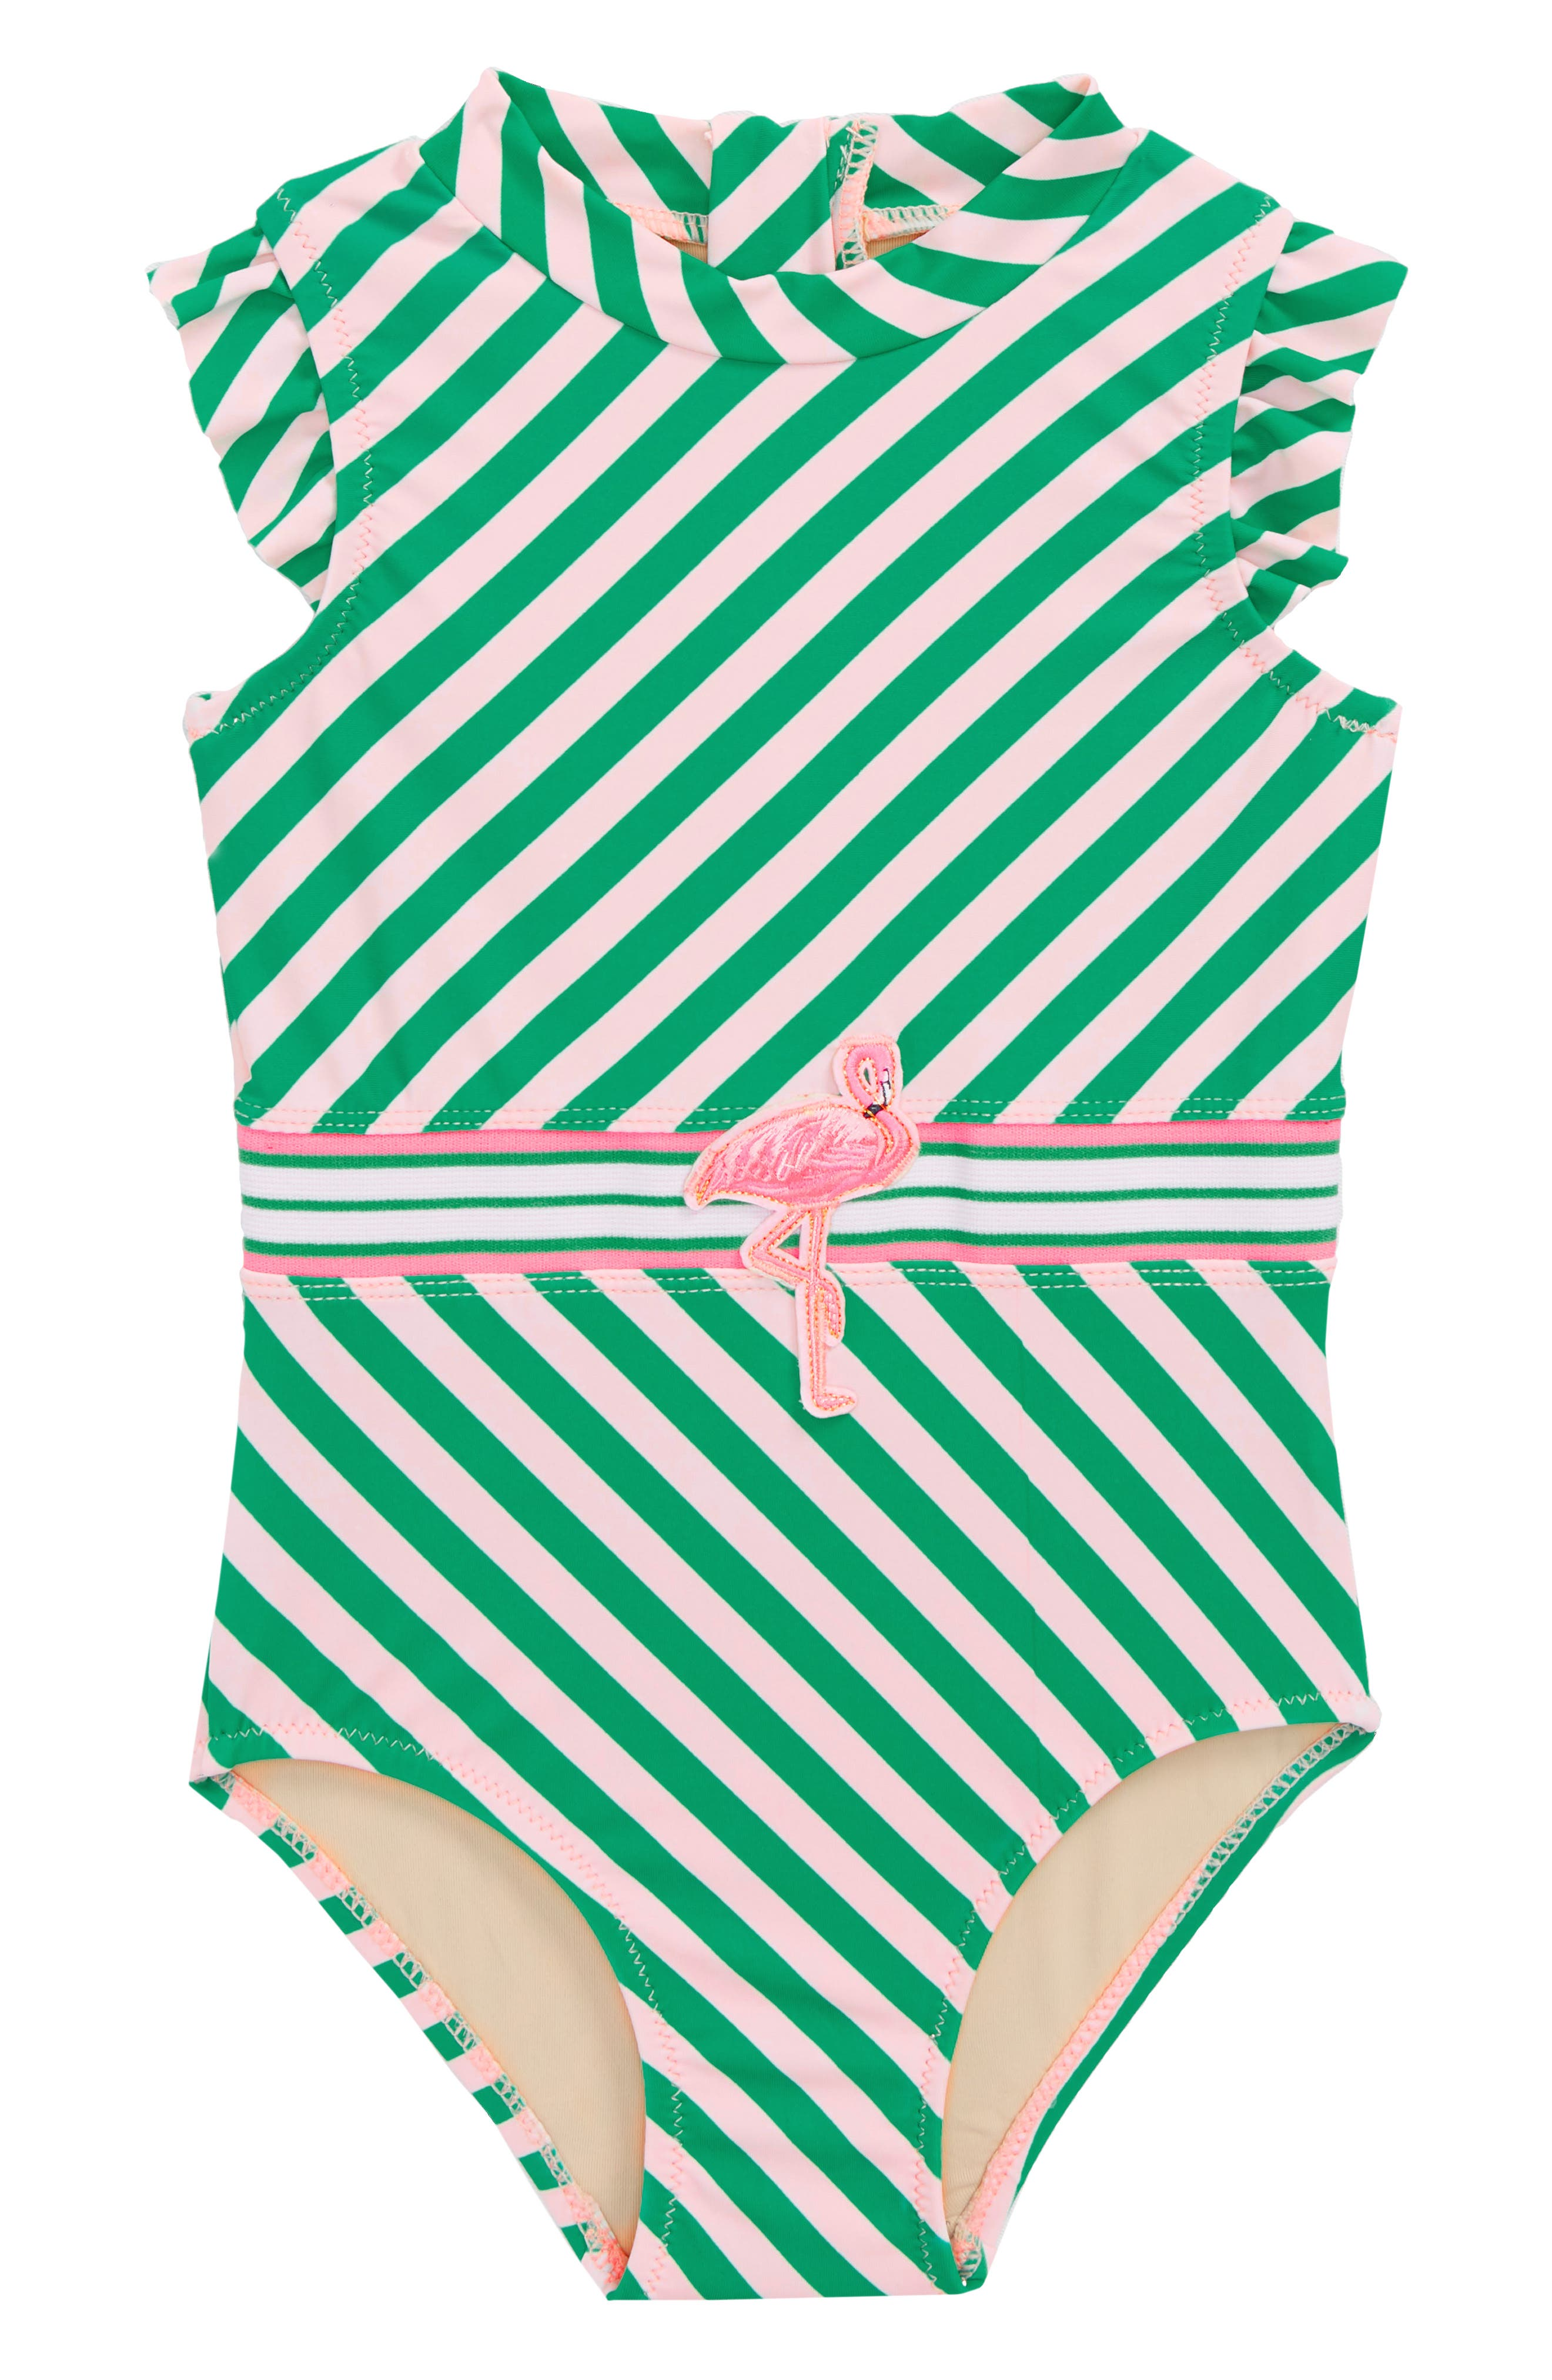 Alternate Image 1 Selected - Shade Critters Flamingo Belt One-Piece Swimsuit (Toddler Girls & Little Girls)